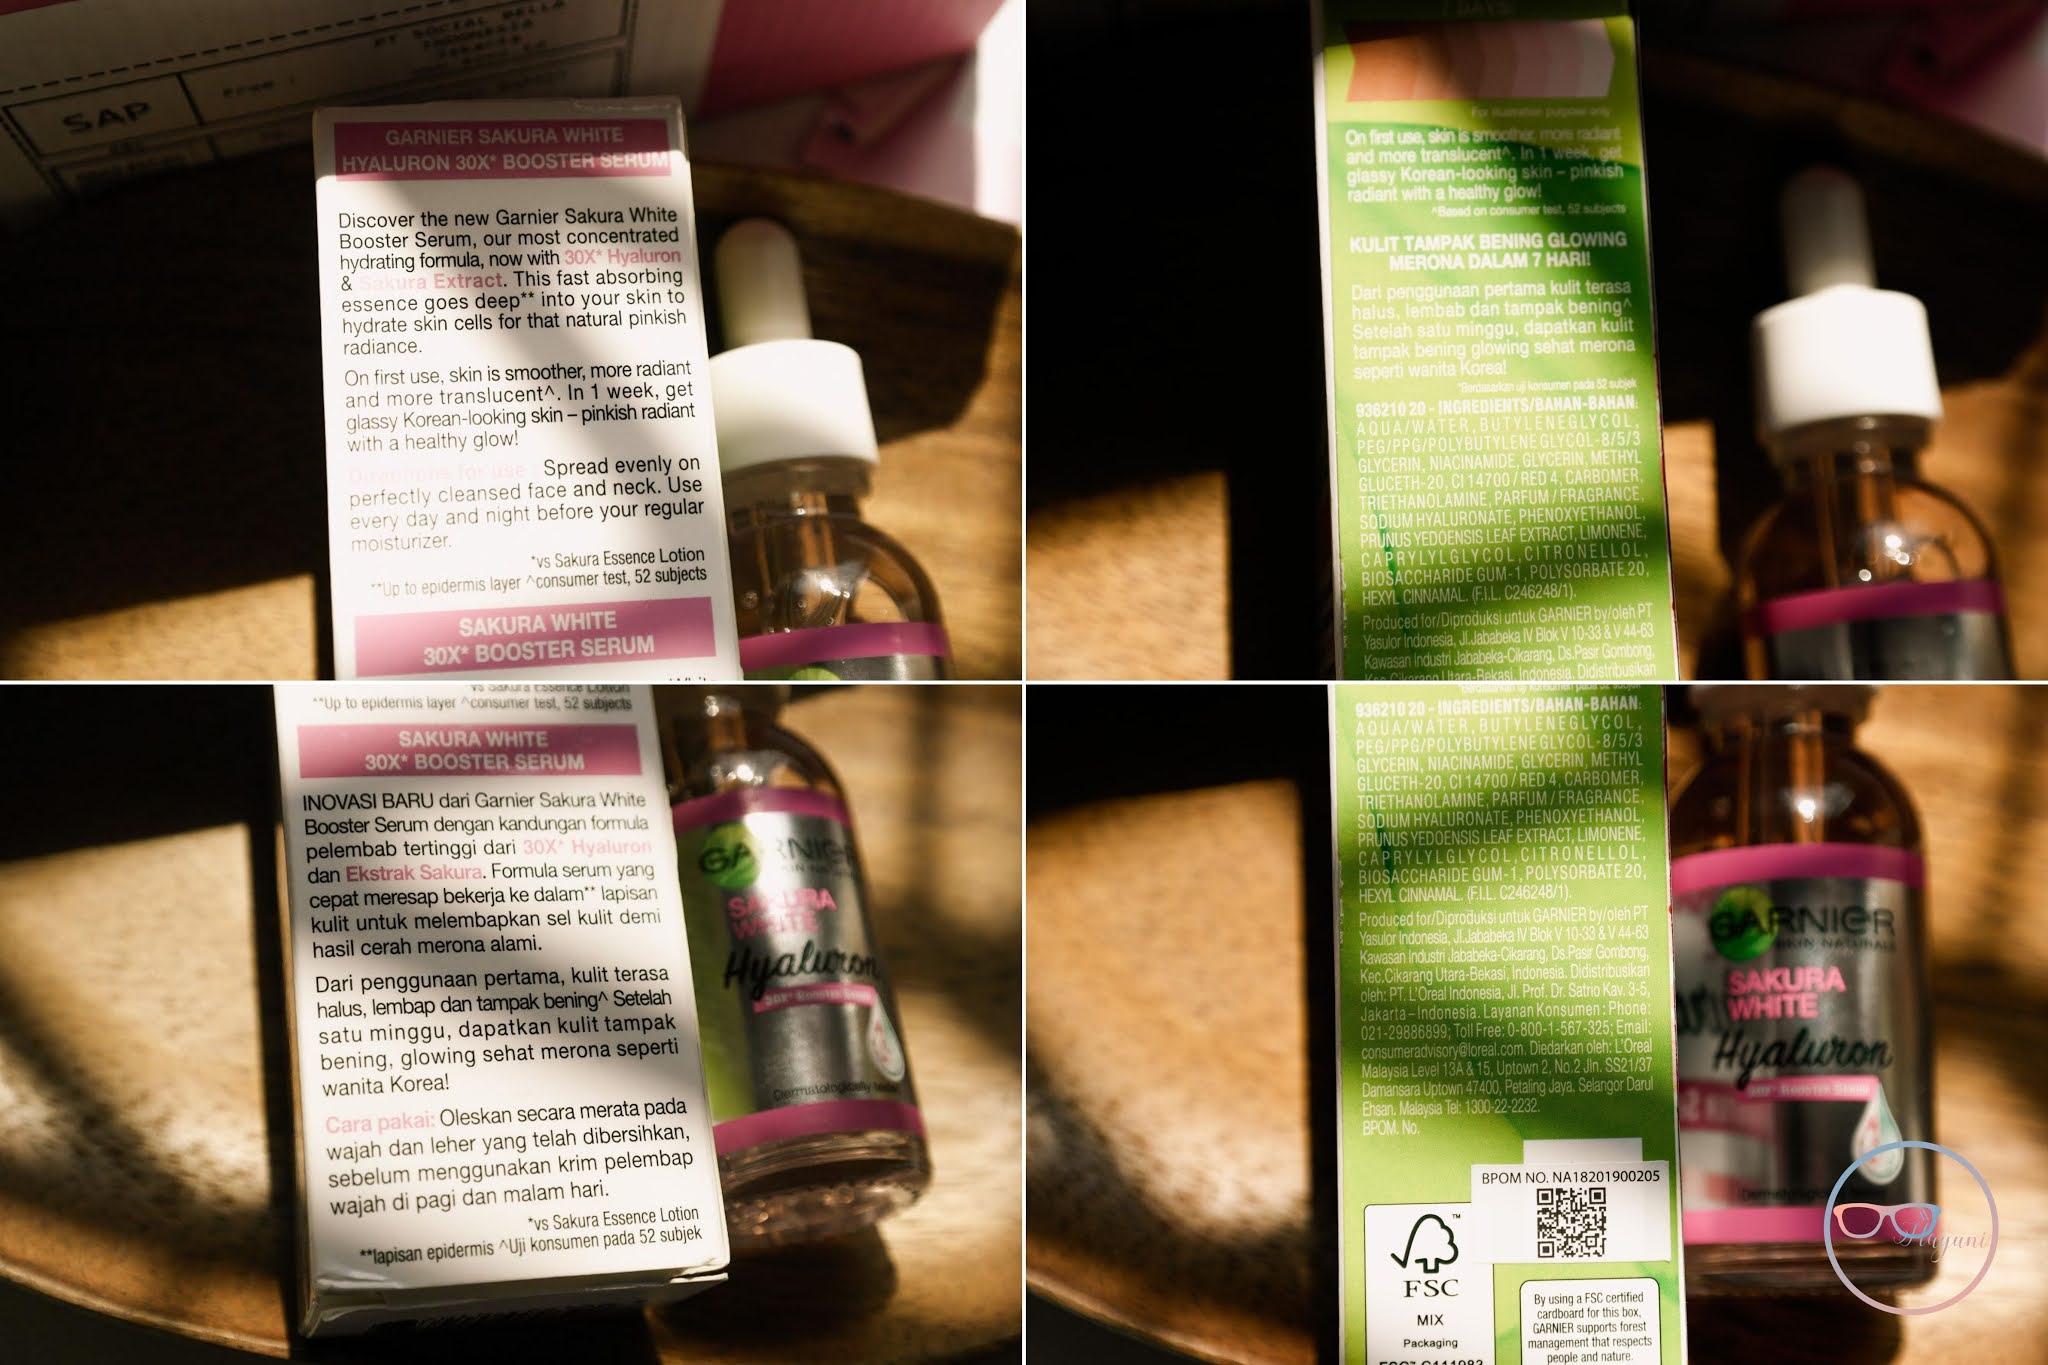 review-garnier-sakura-white-30x-hyaluron-booster-serum